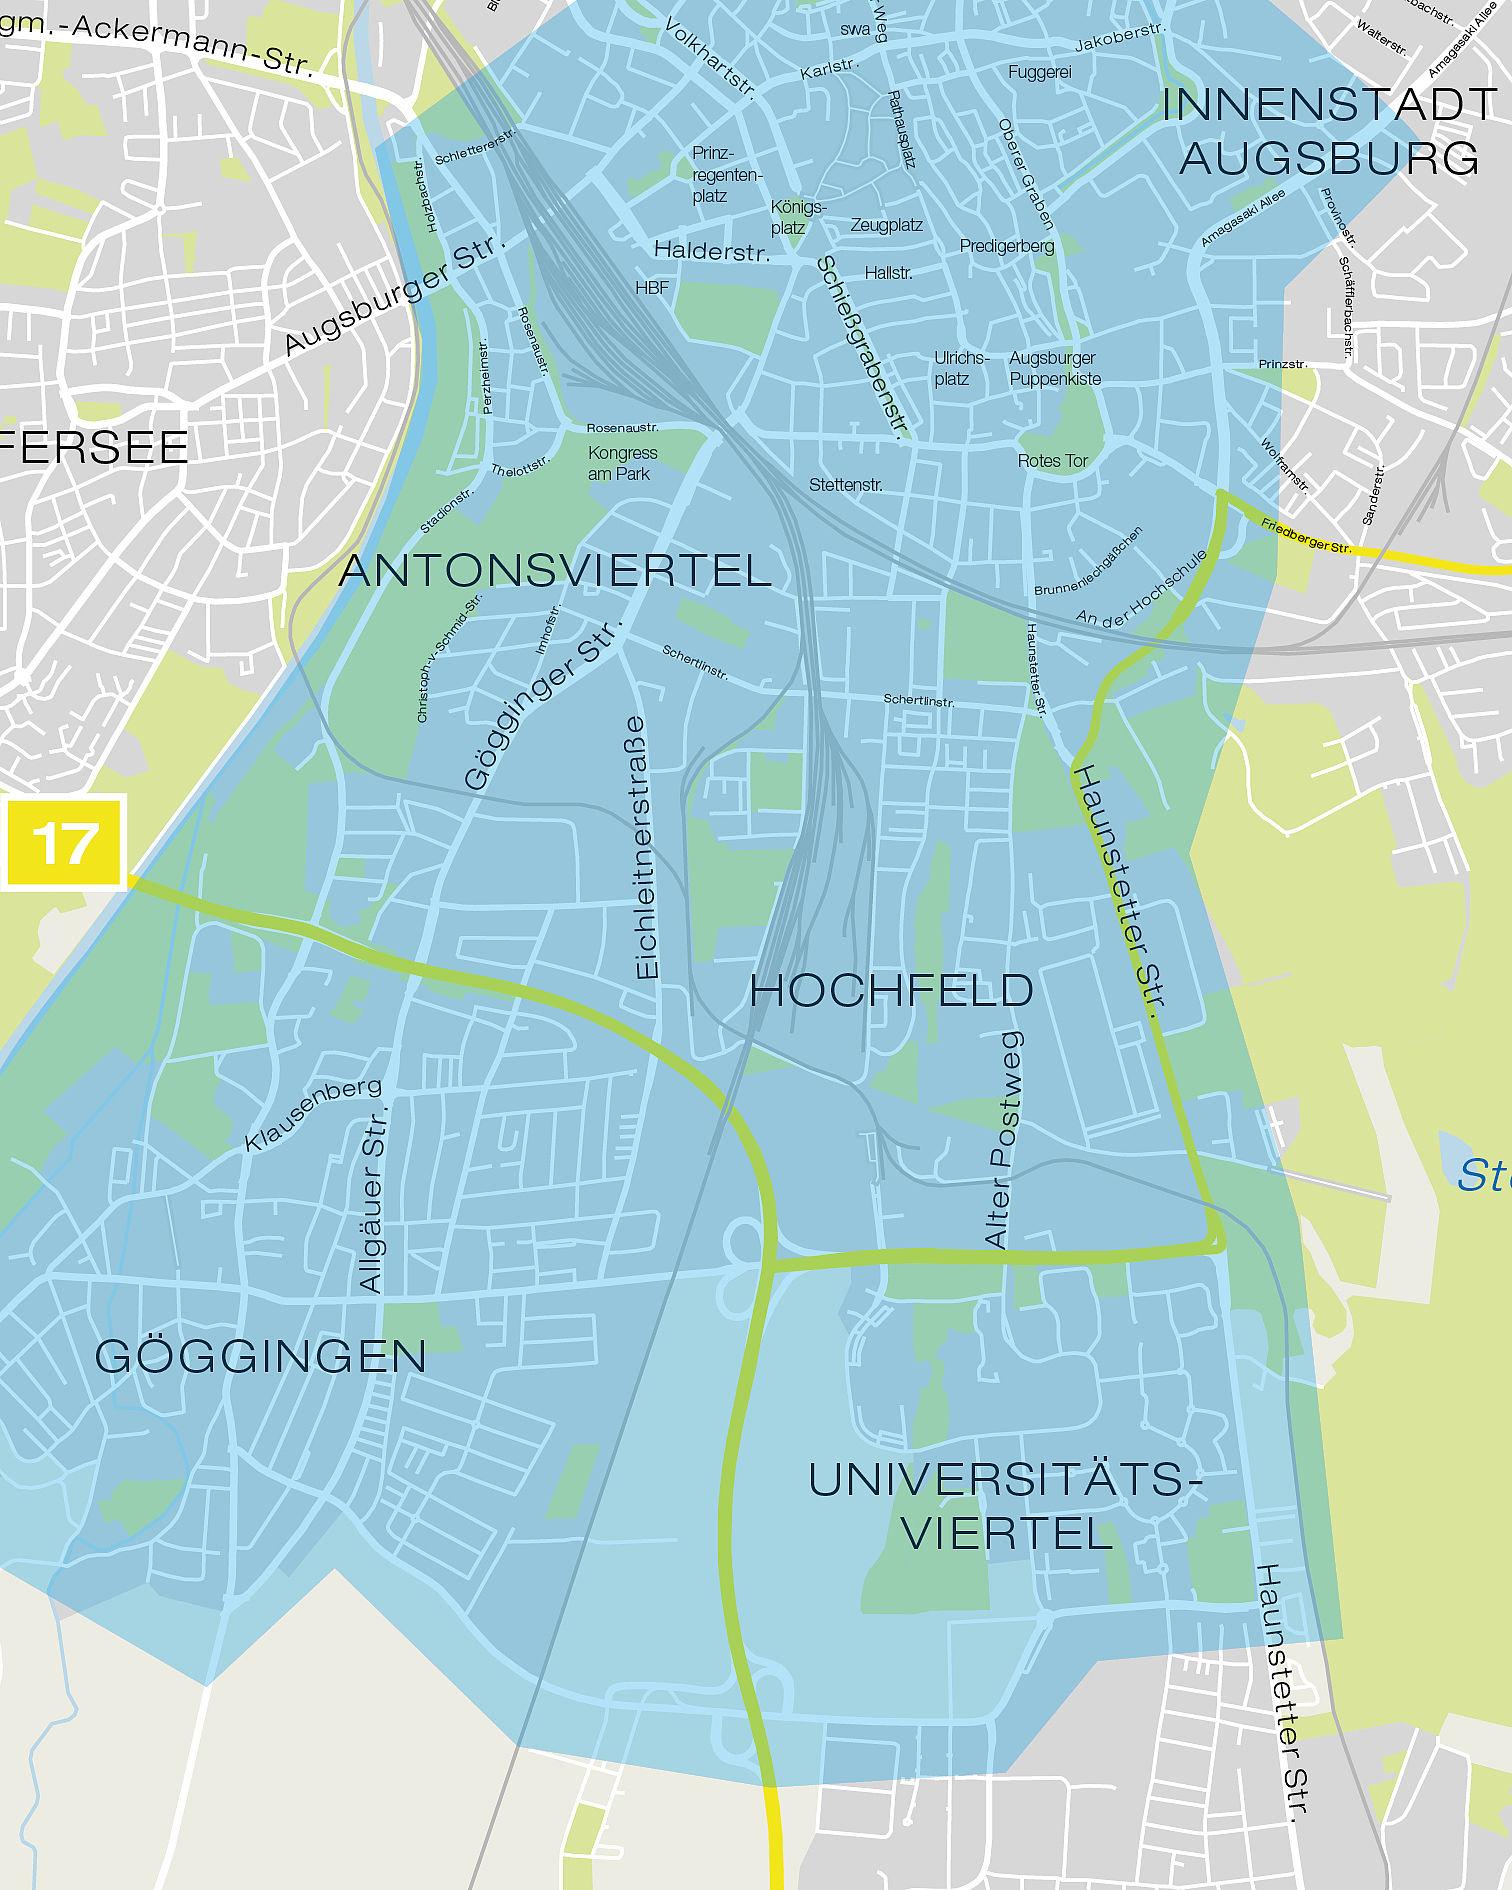 https://www.sw-augsburg.de/fileadmin/content/3_Mobilitaet/2_Produkte/swaxi_Karte.jpg